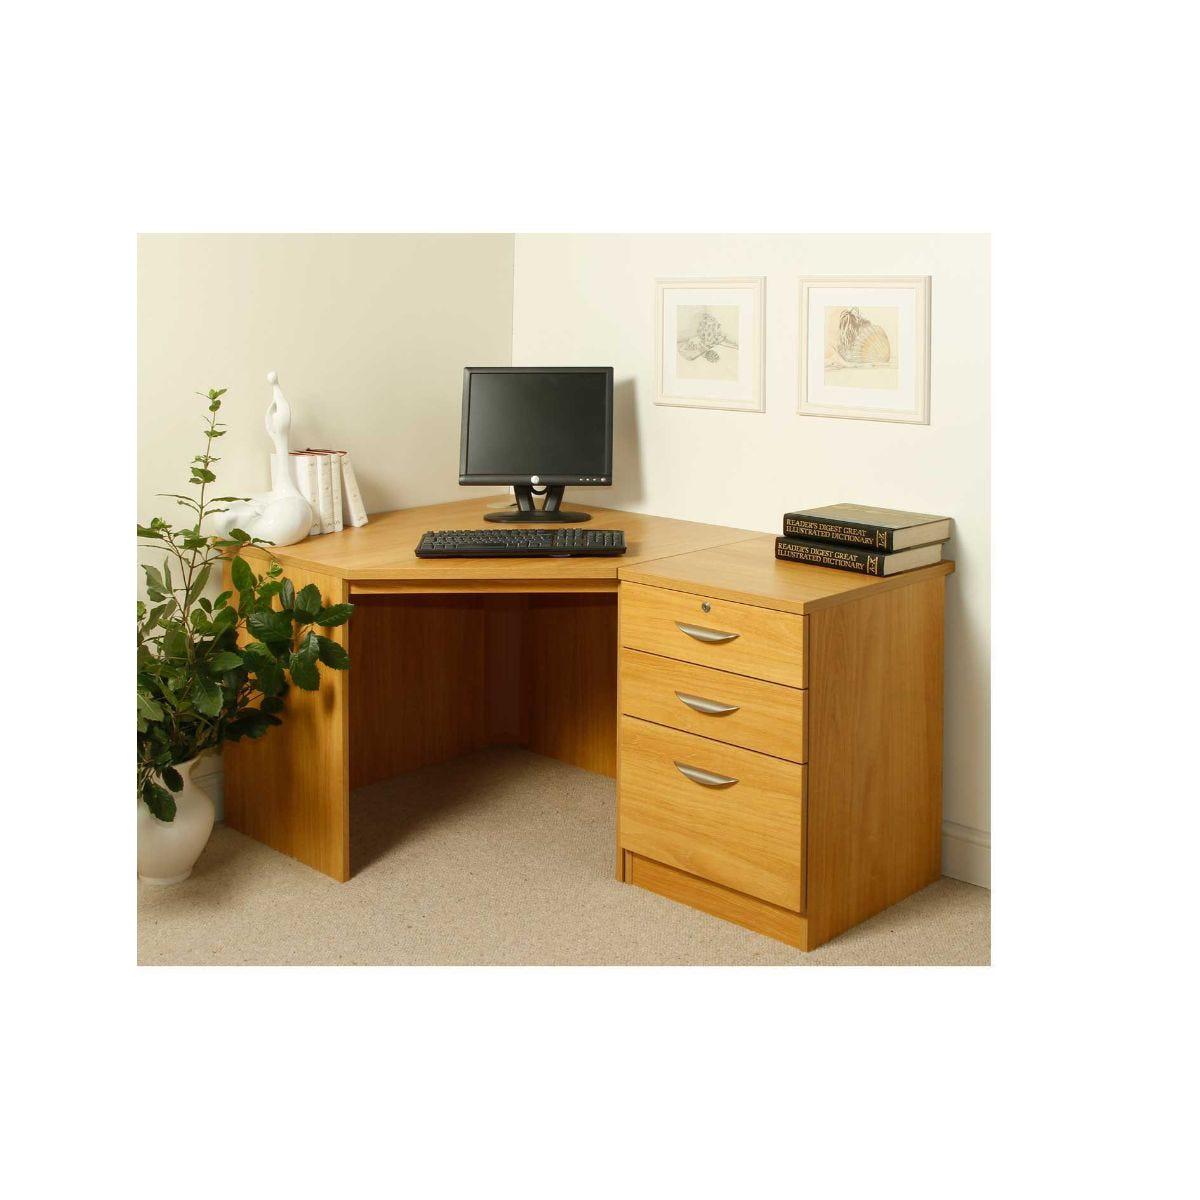 R White Burne Jones Desk Workstation, English Oak